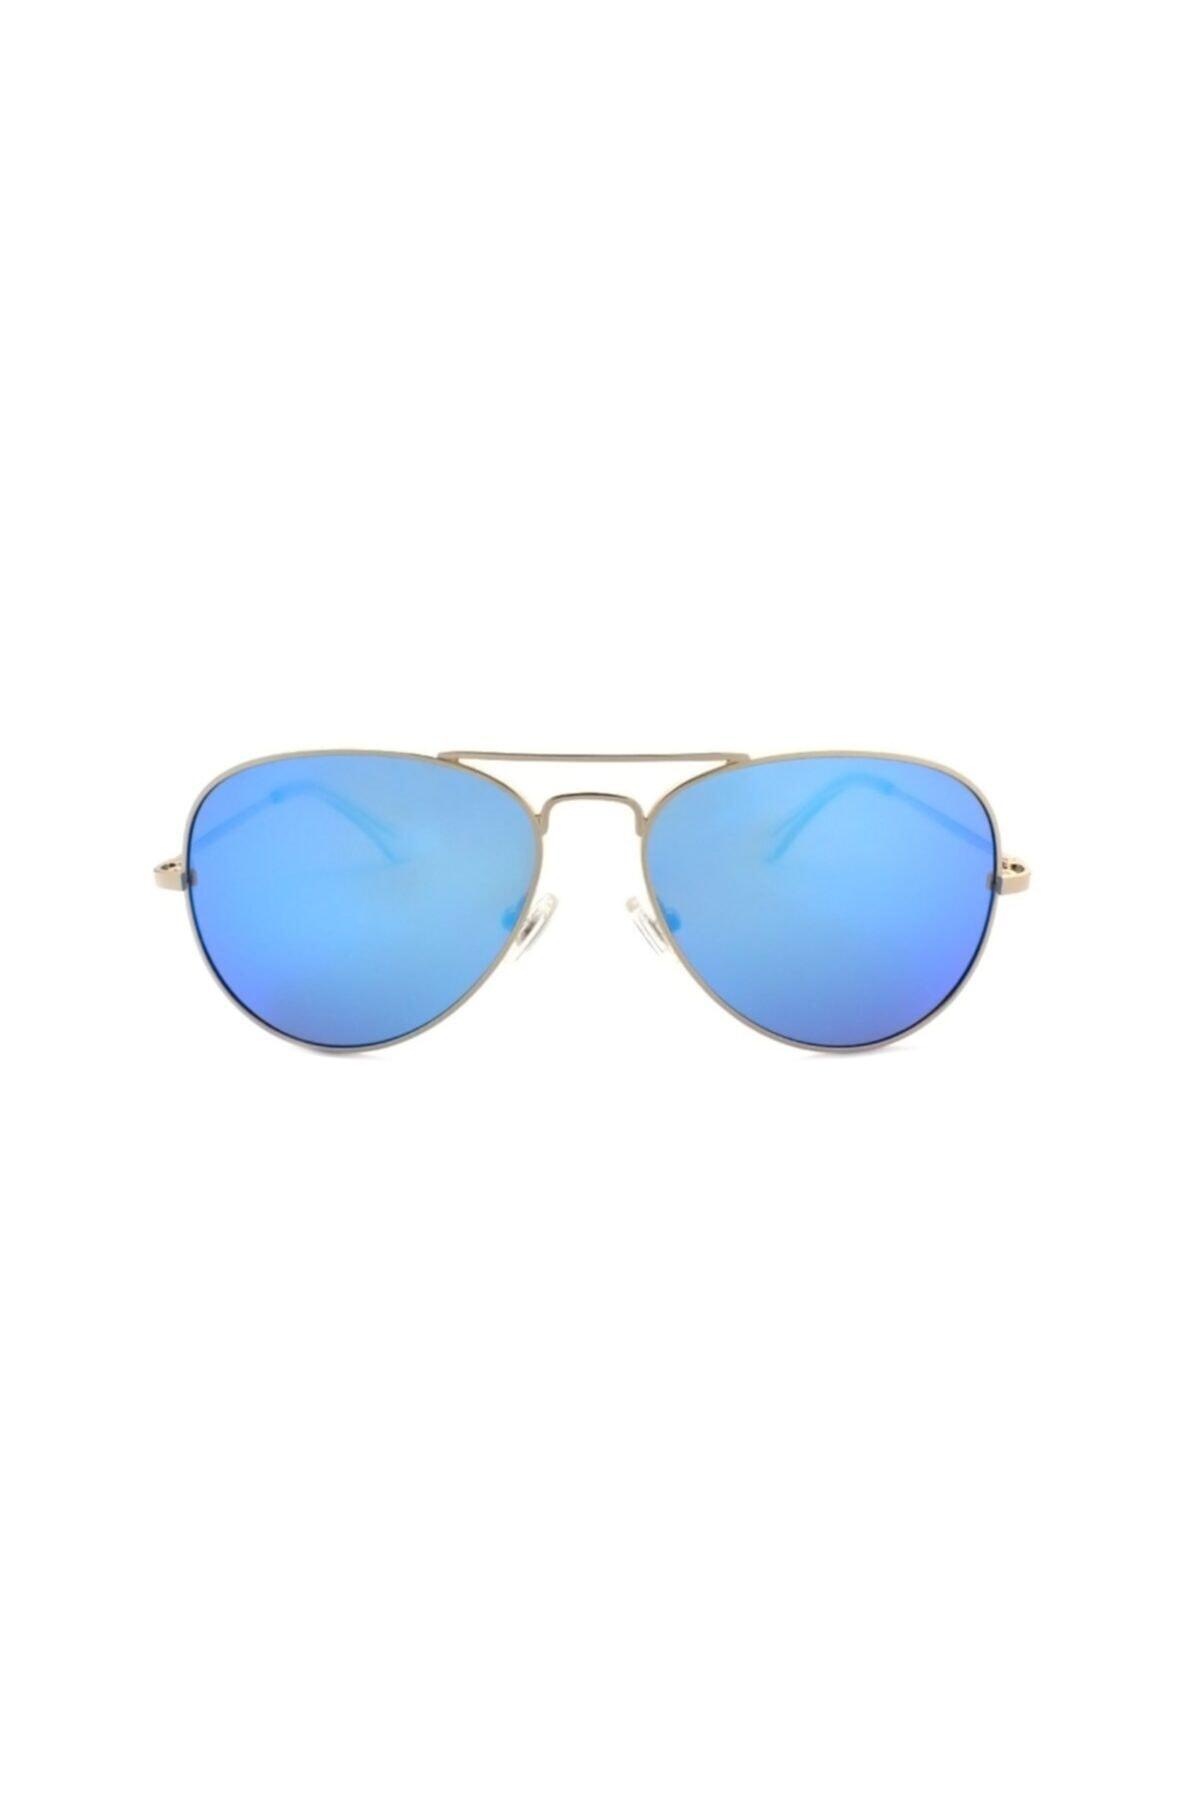 خرید پستی عینک آفتابی مردانه پارچه  برند Topten Eyewear رنگ آبی کد ty41638990